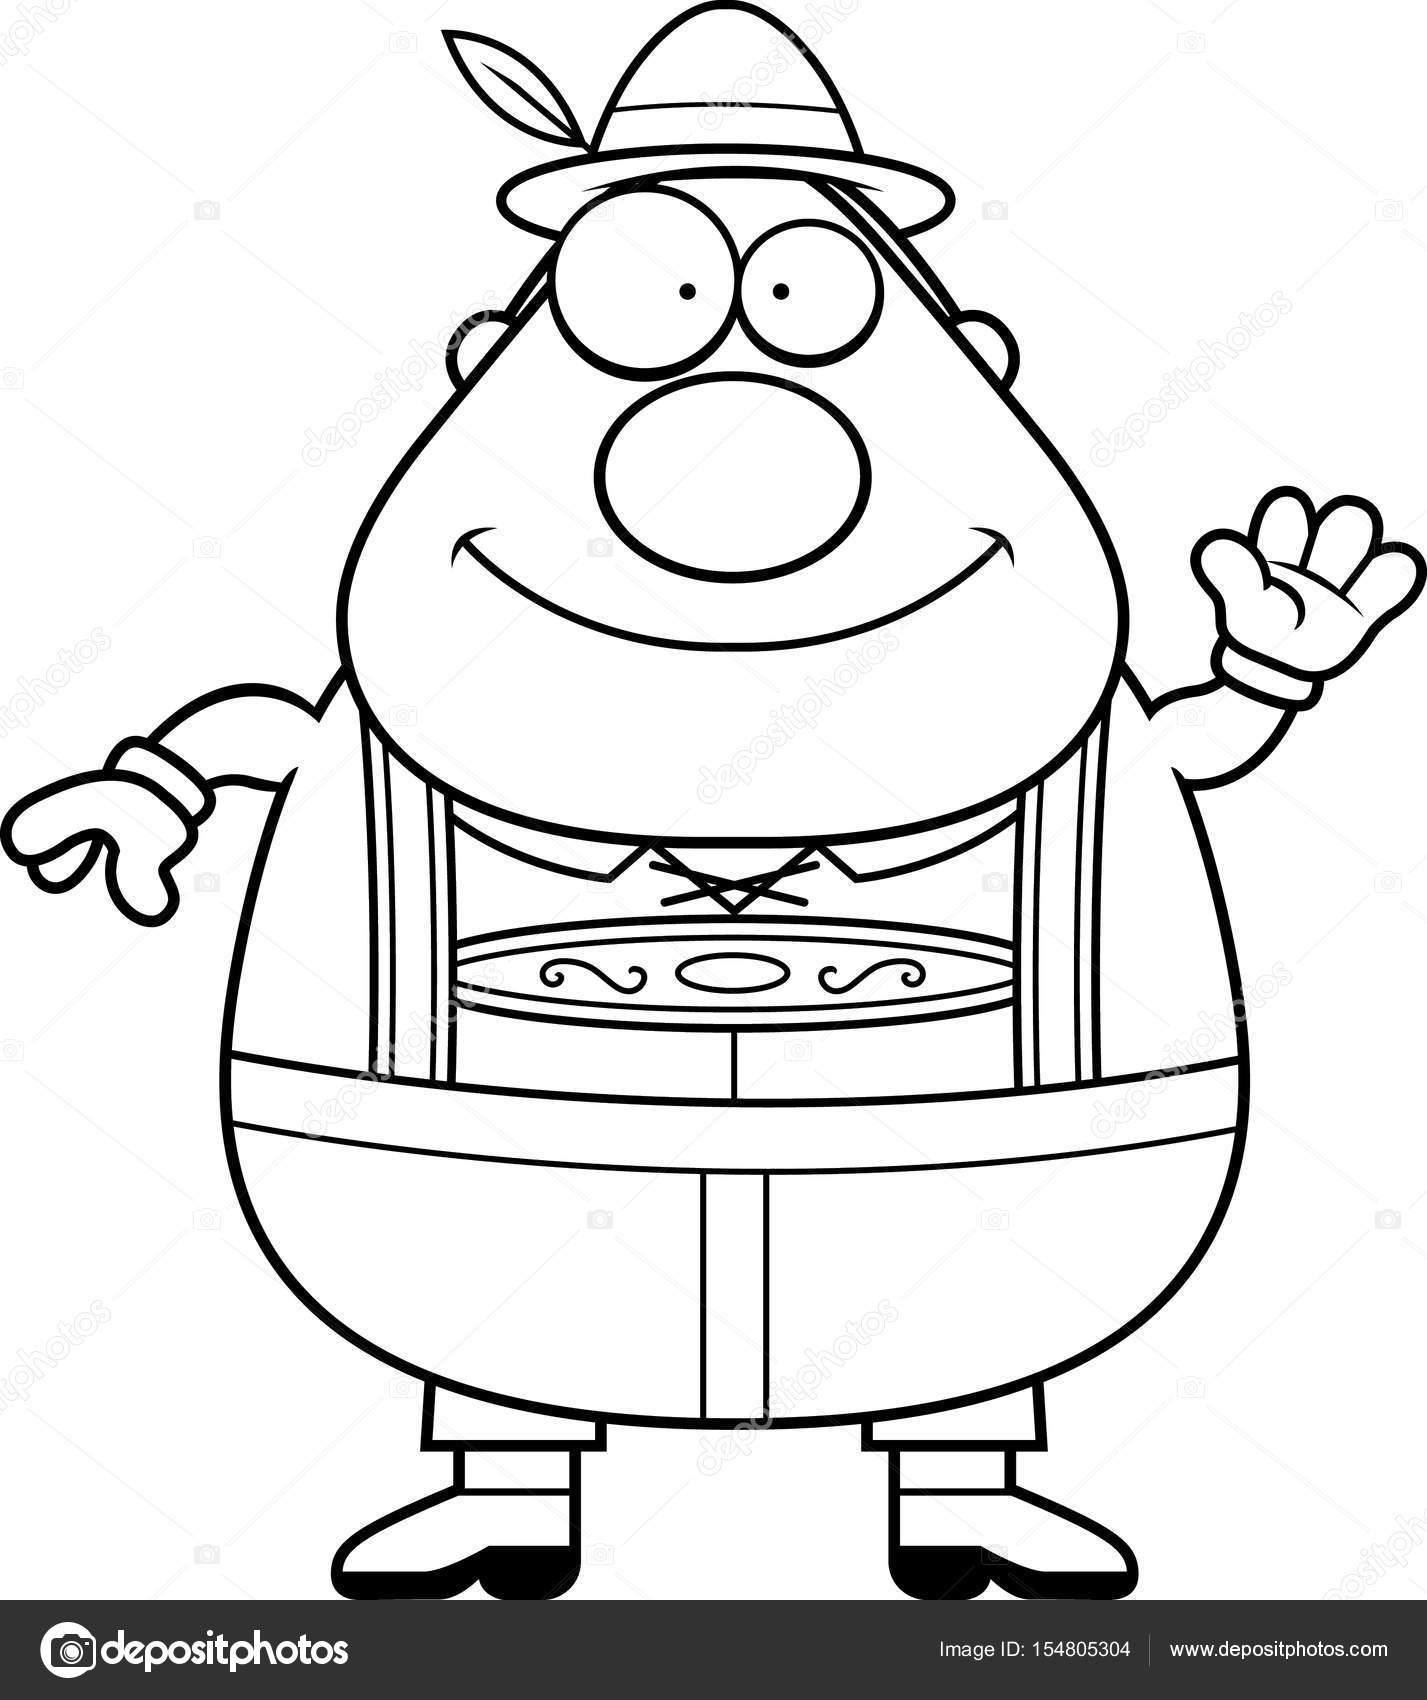 Lederhosen Drawing At Getdrawings